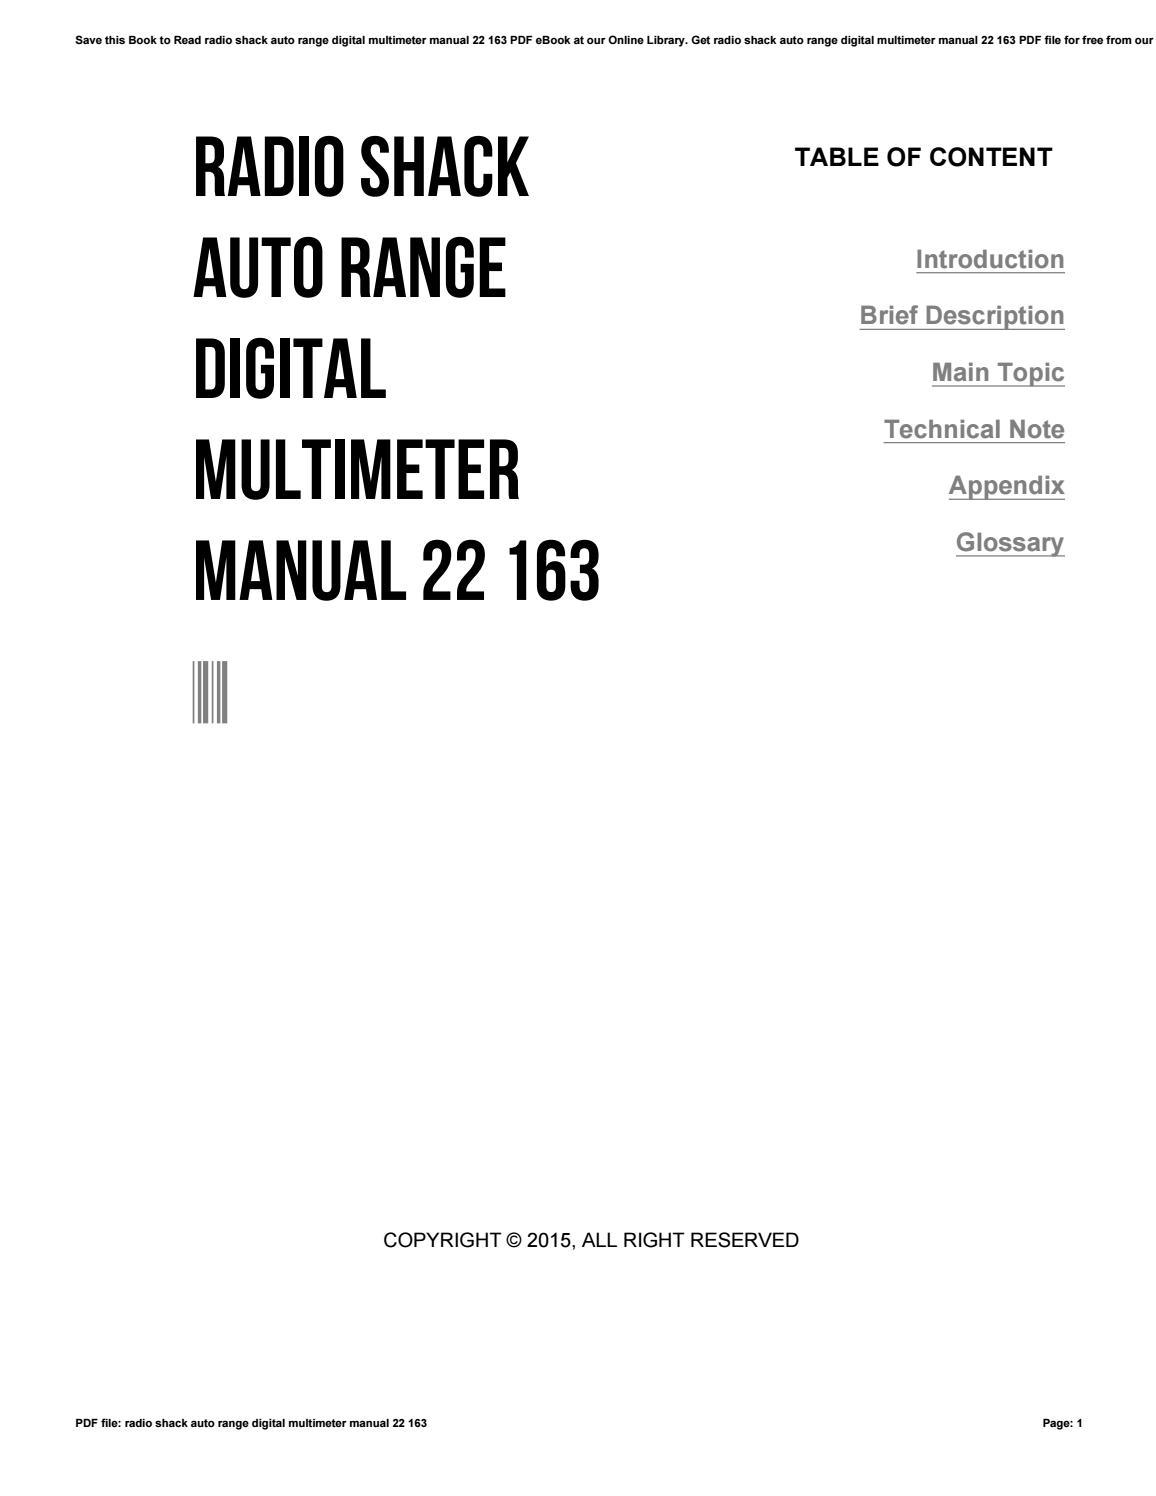 Radio shack auto range digital multimeter manual 22 163 by